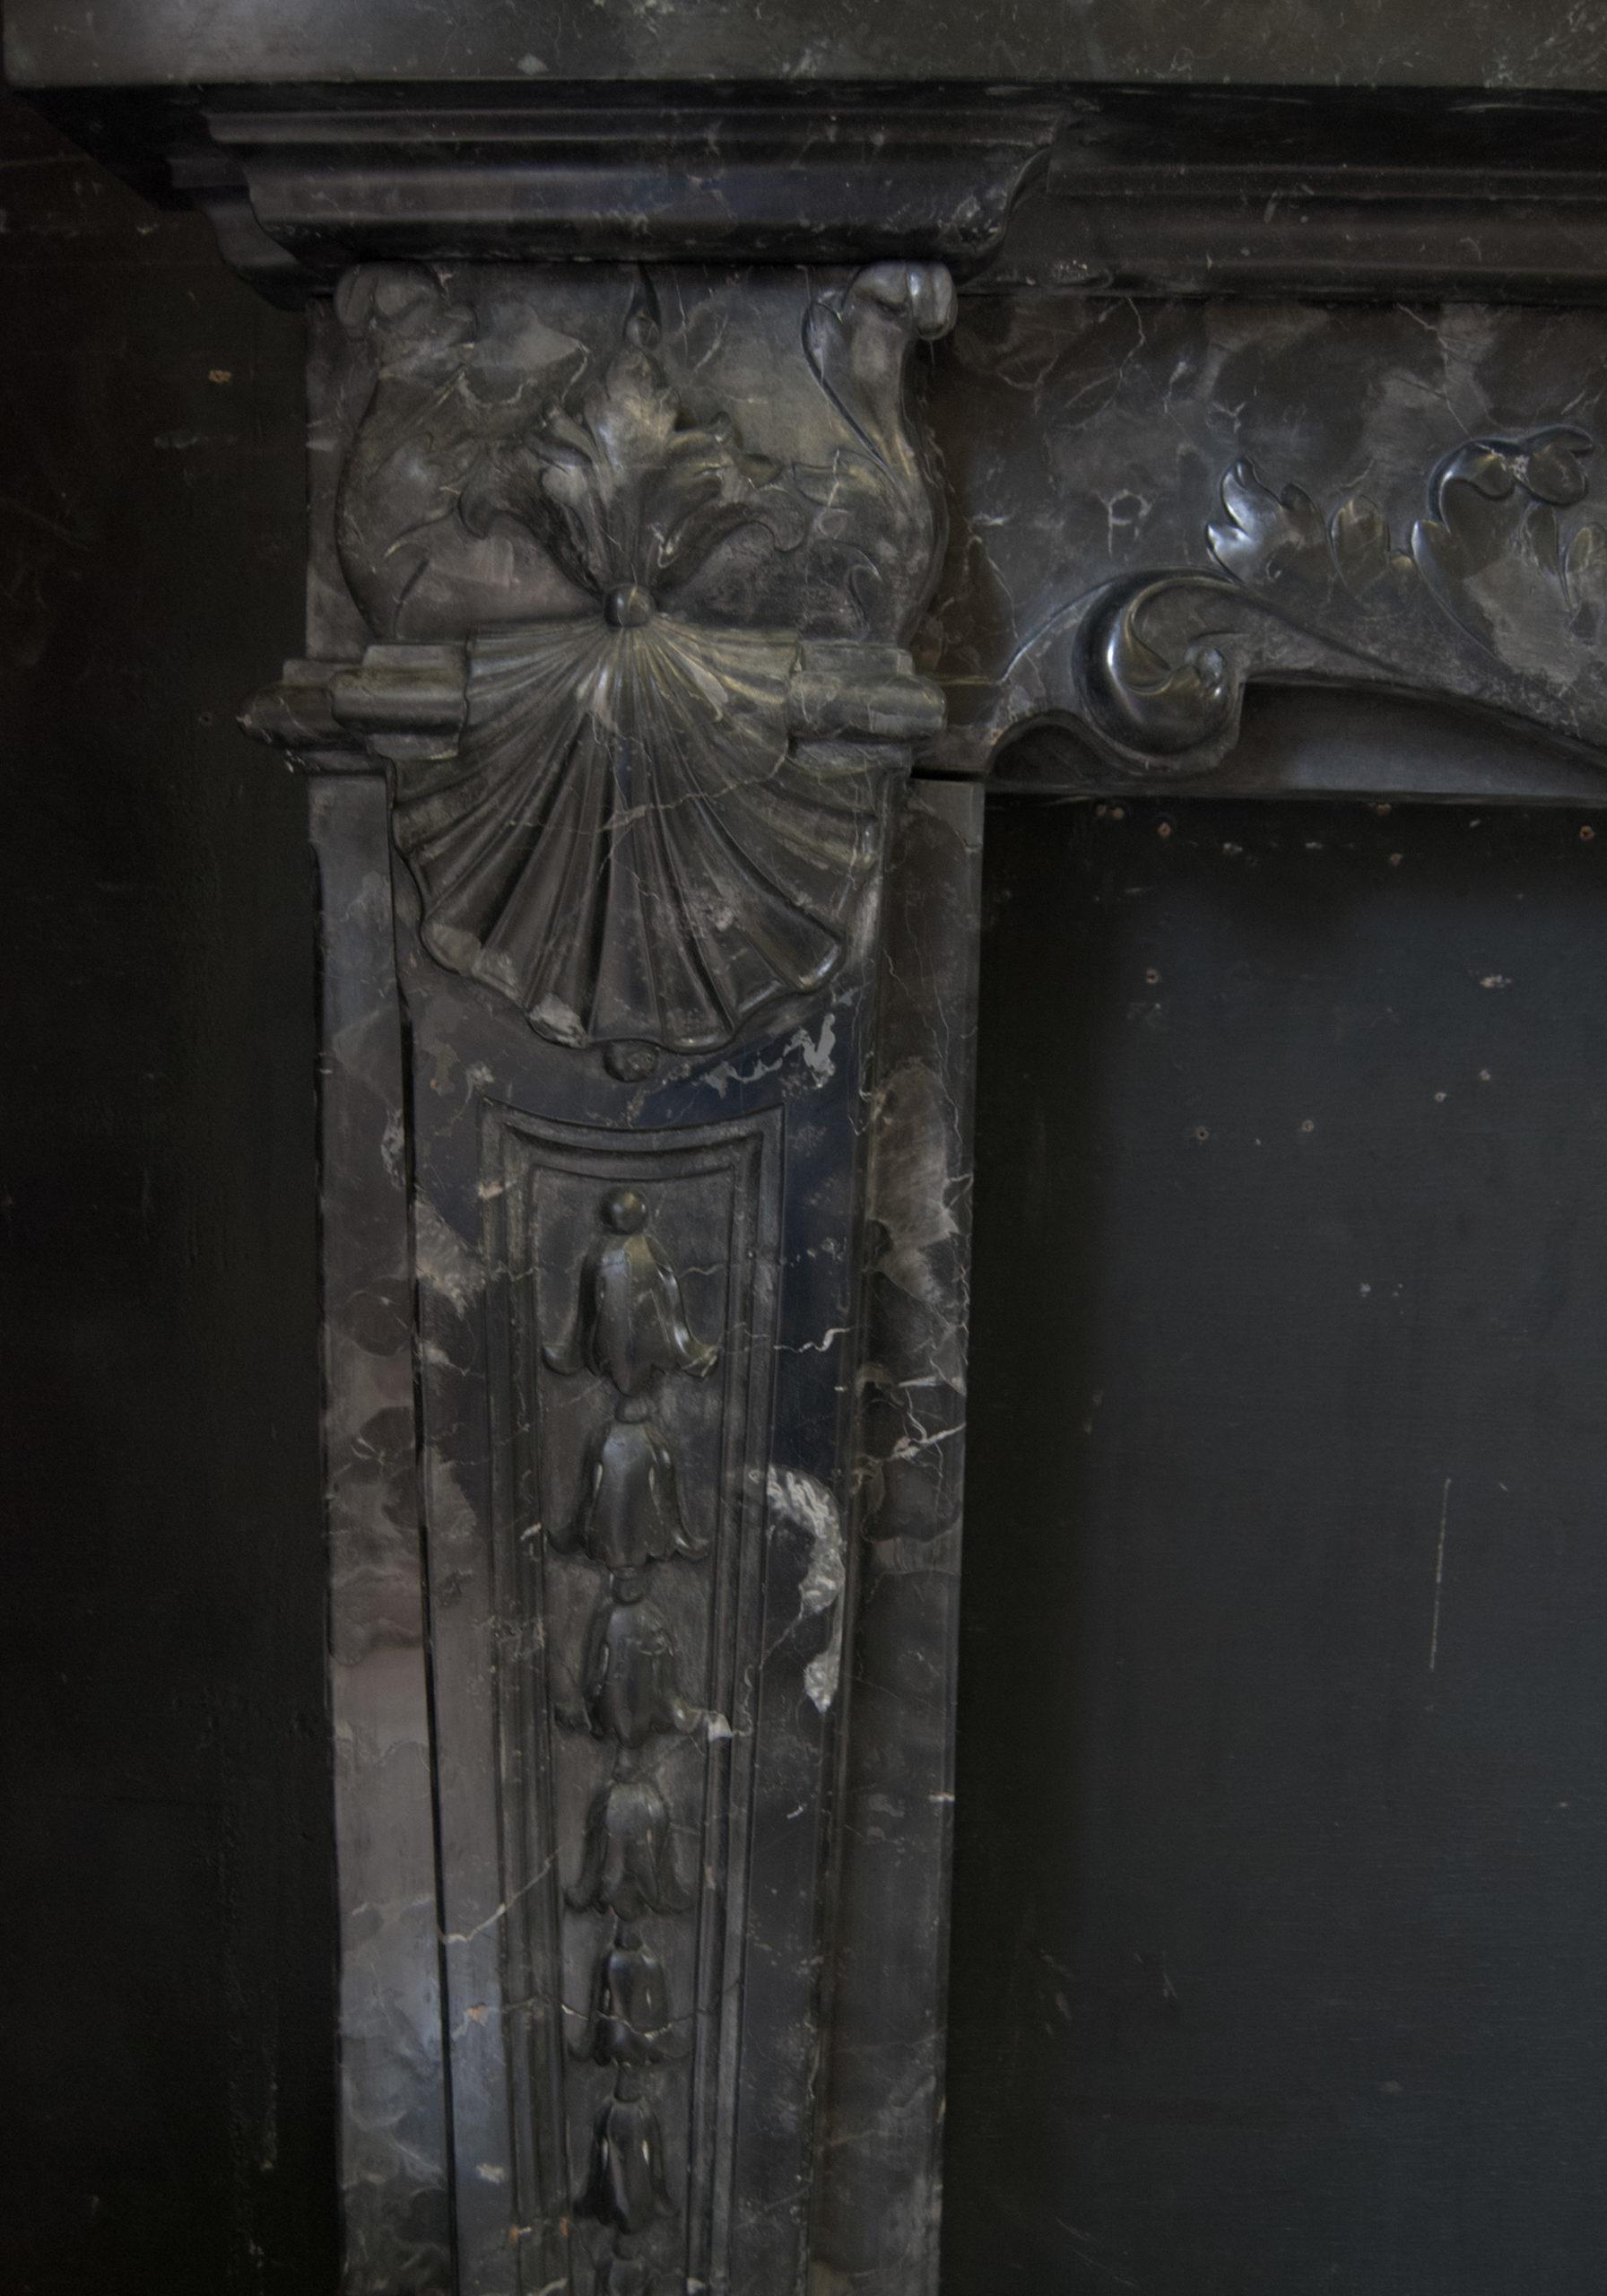 Antique Italian marble chimneypiece - detail